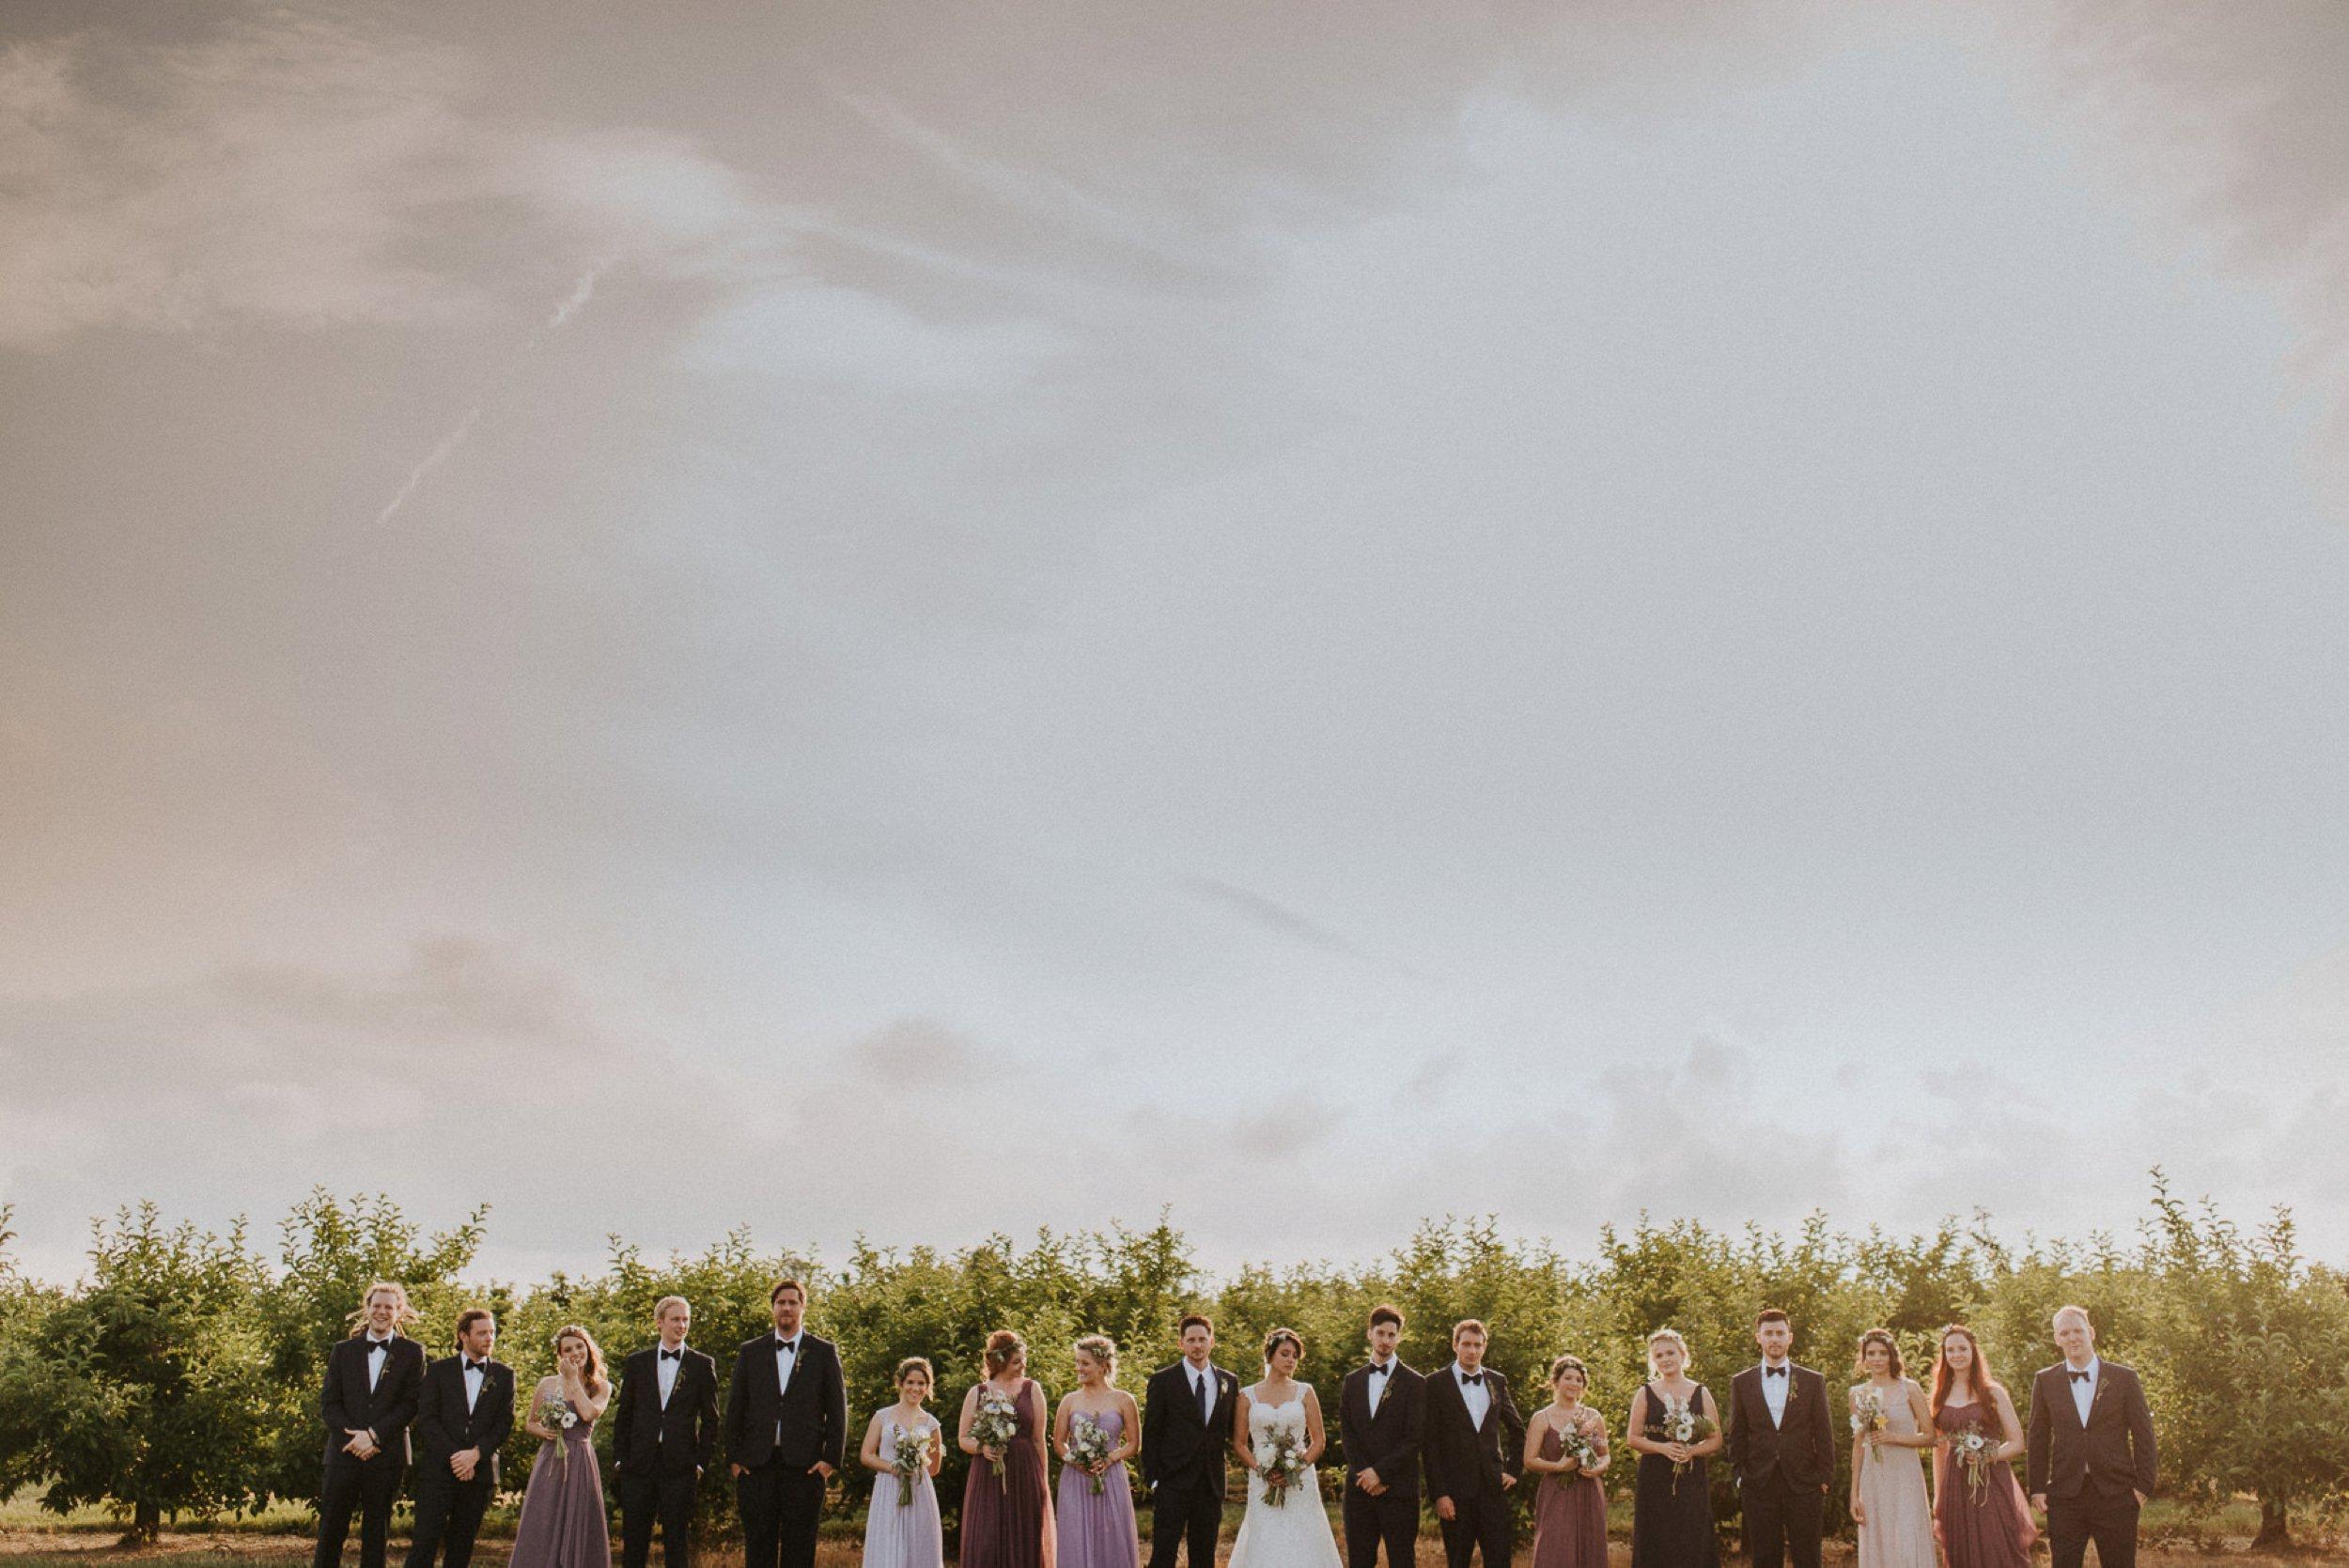 milburn_farms-wedding-56.jpg